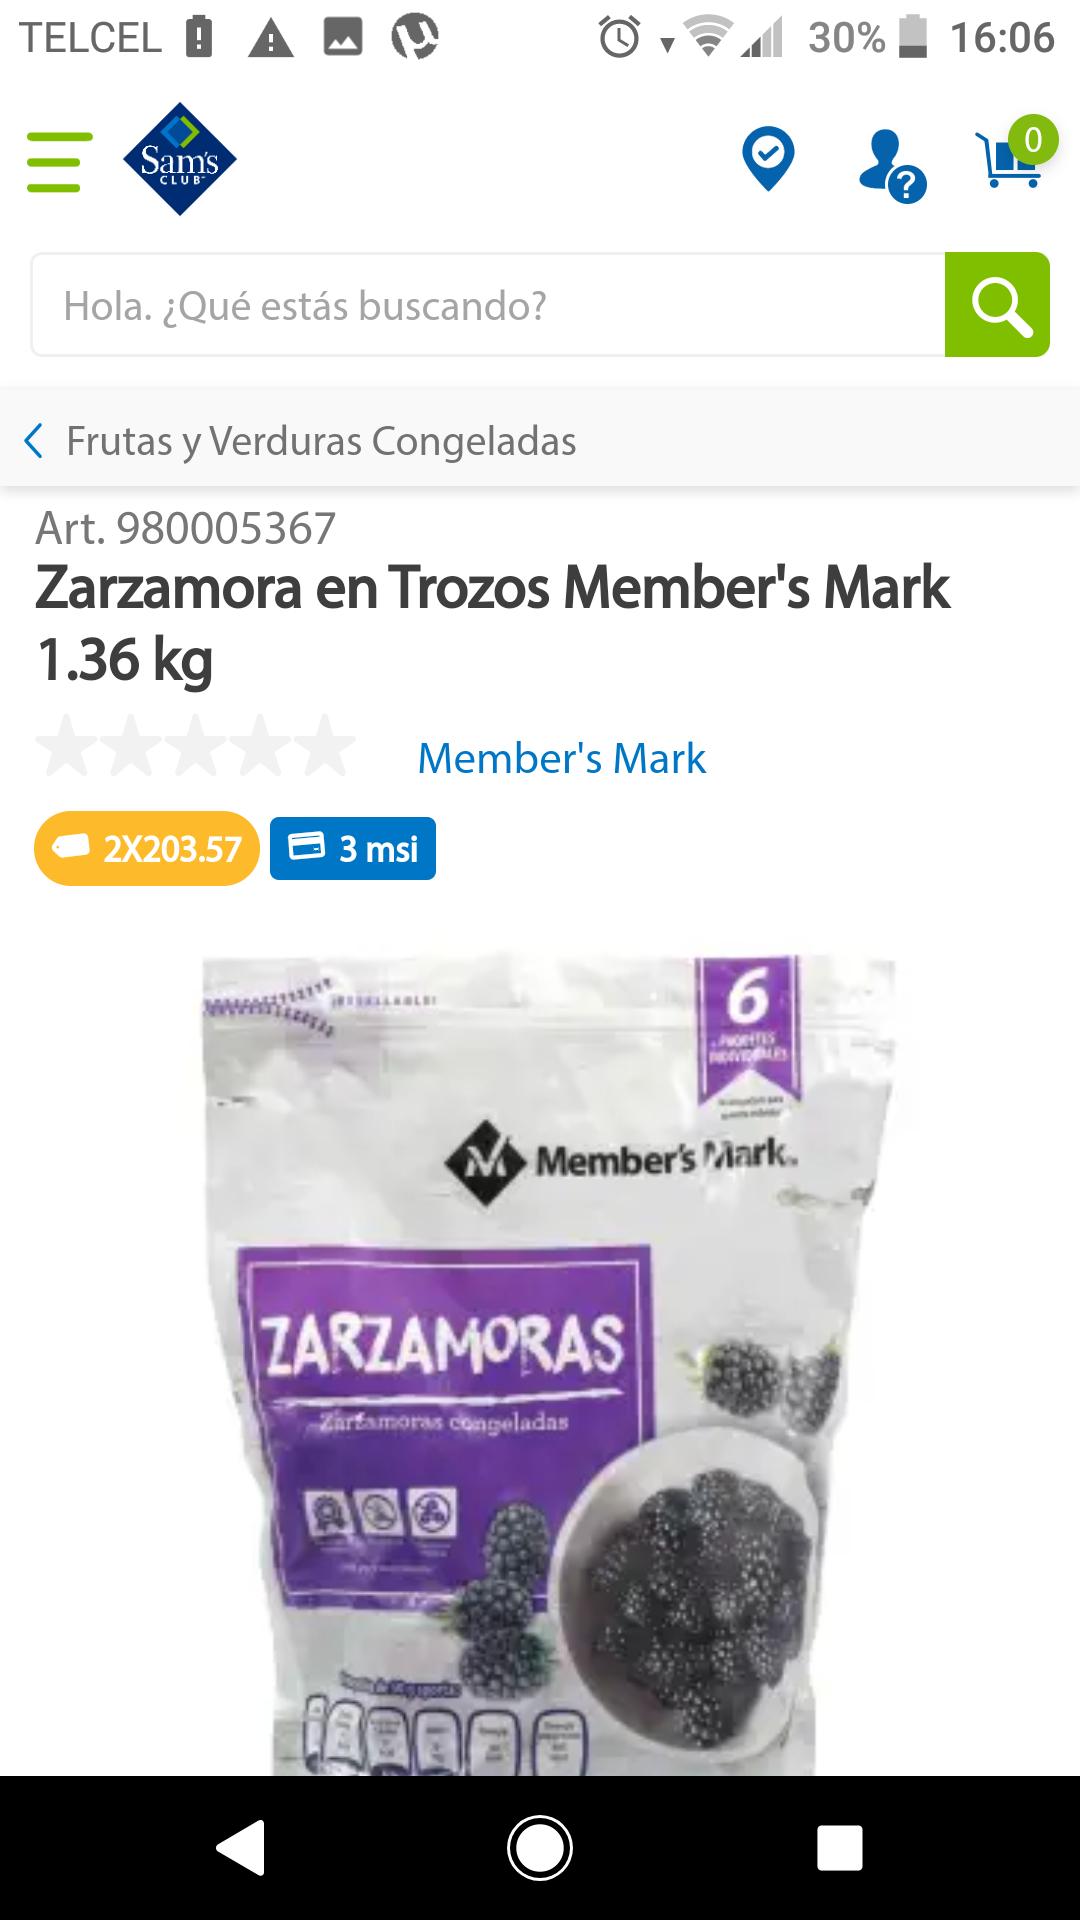 Sam's Club: Zarzamora congelada 2.70 kilos